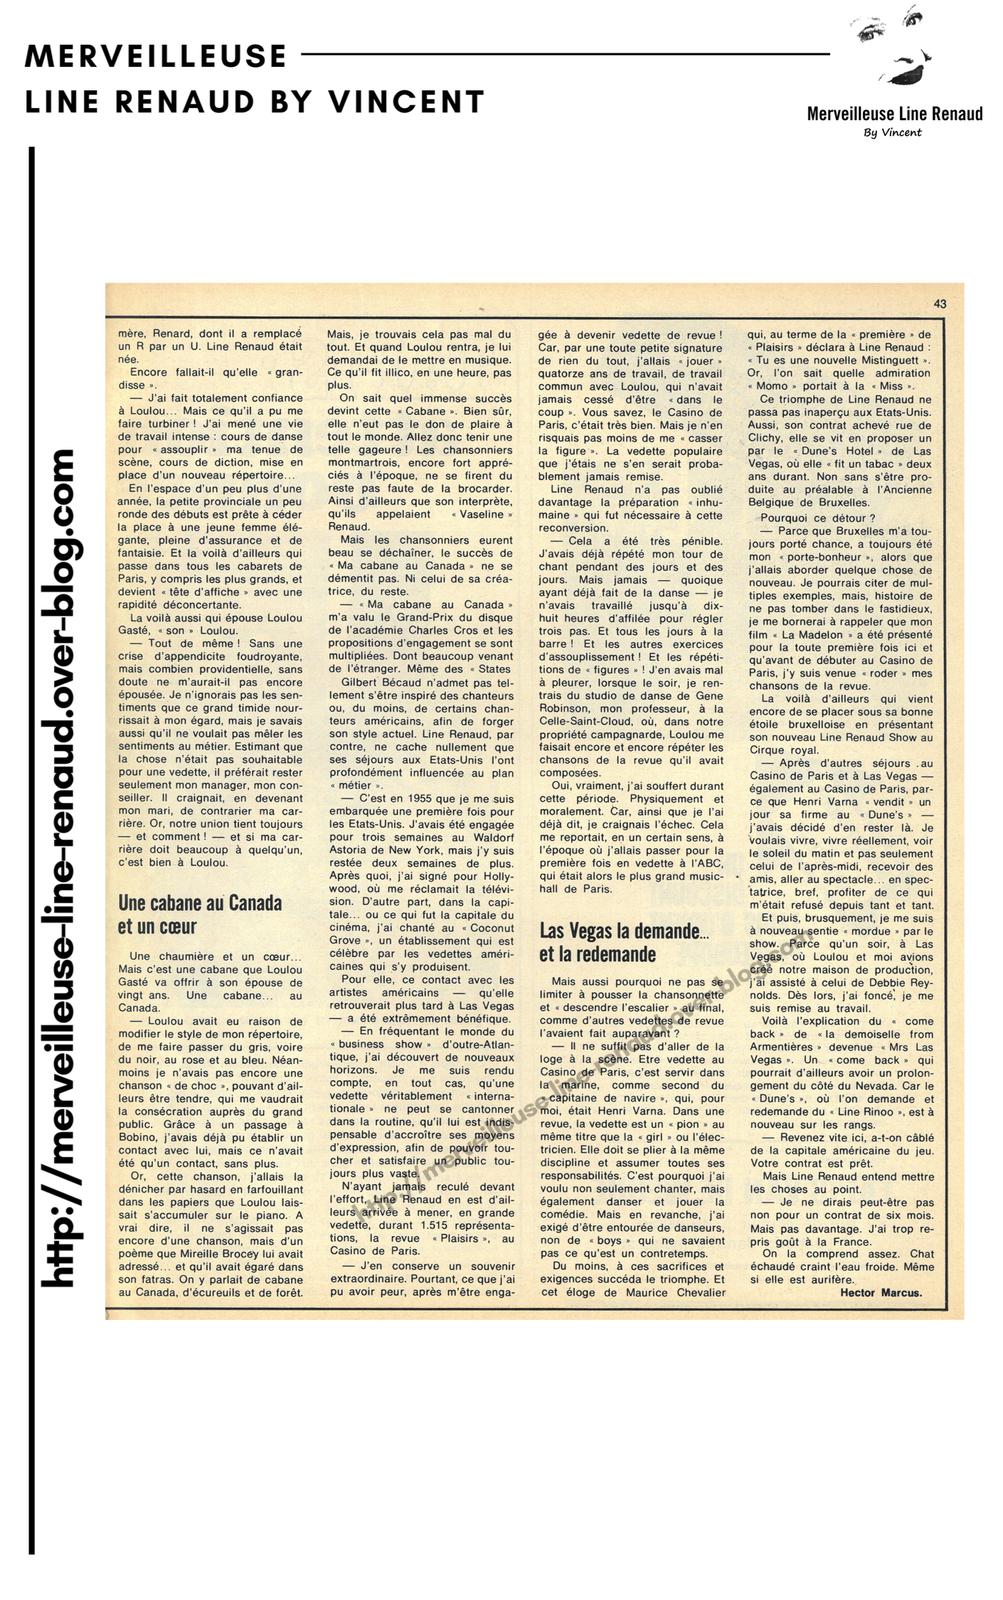 PRESSE: Le soir illustrée -n°2233 - 6 avril 1975